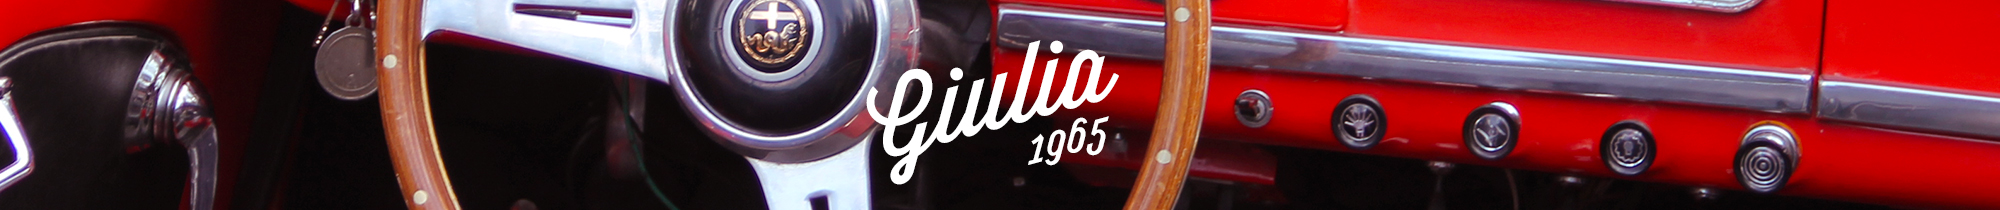 bandeau-giulia-spider1965rosso-02